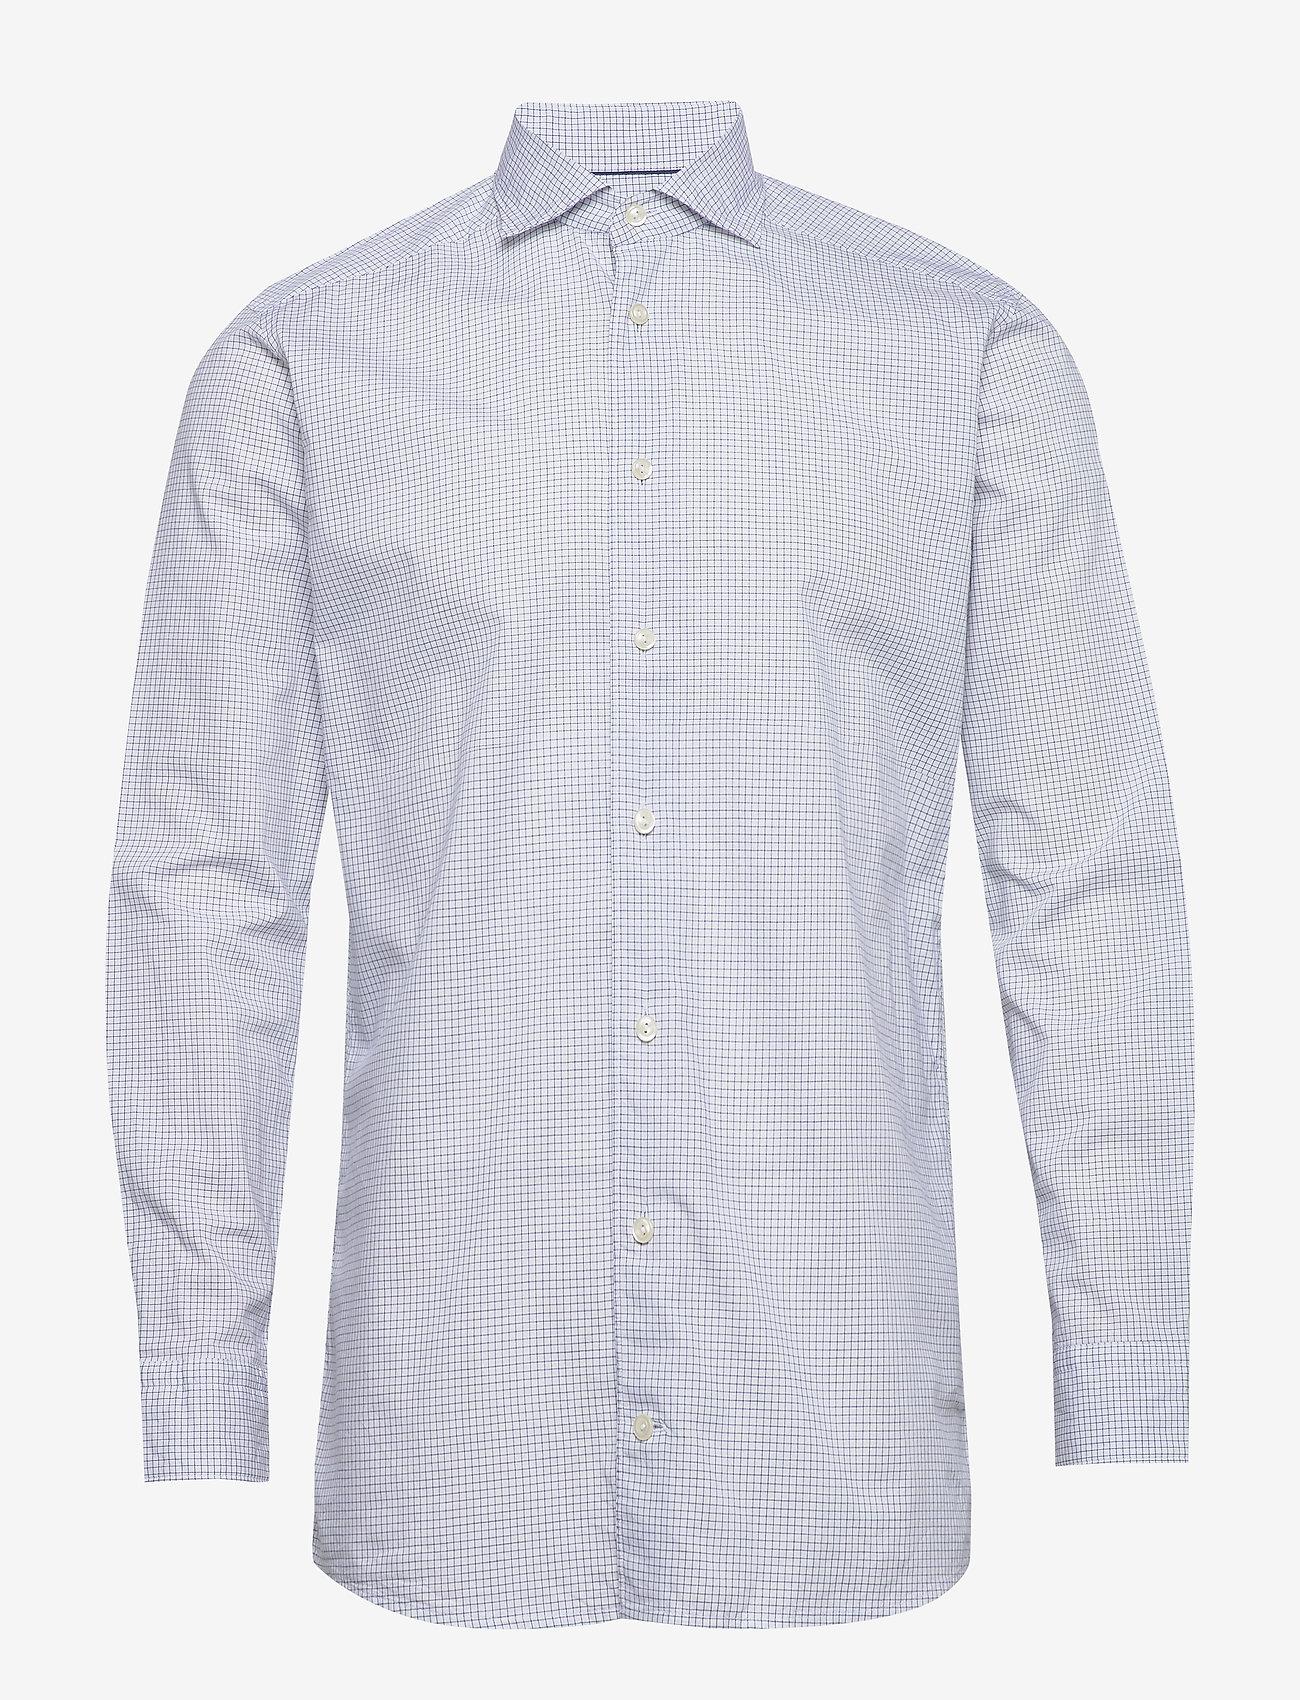 Eton - Navy checked cotton silk shirt – soft - ruutupaidat - navy